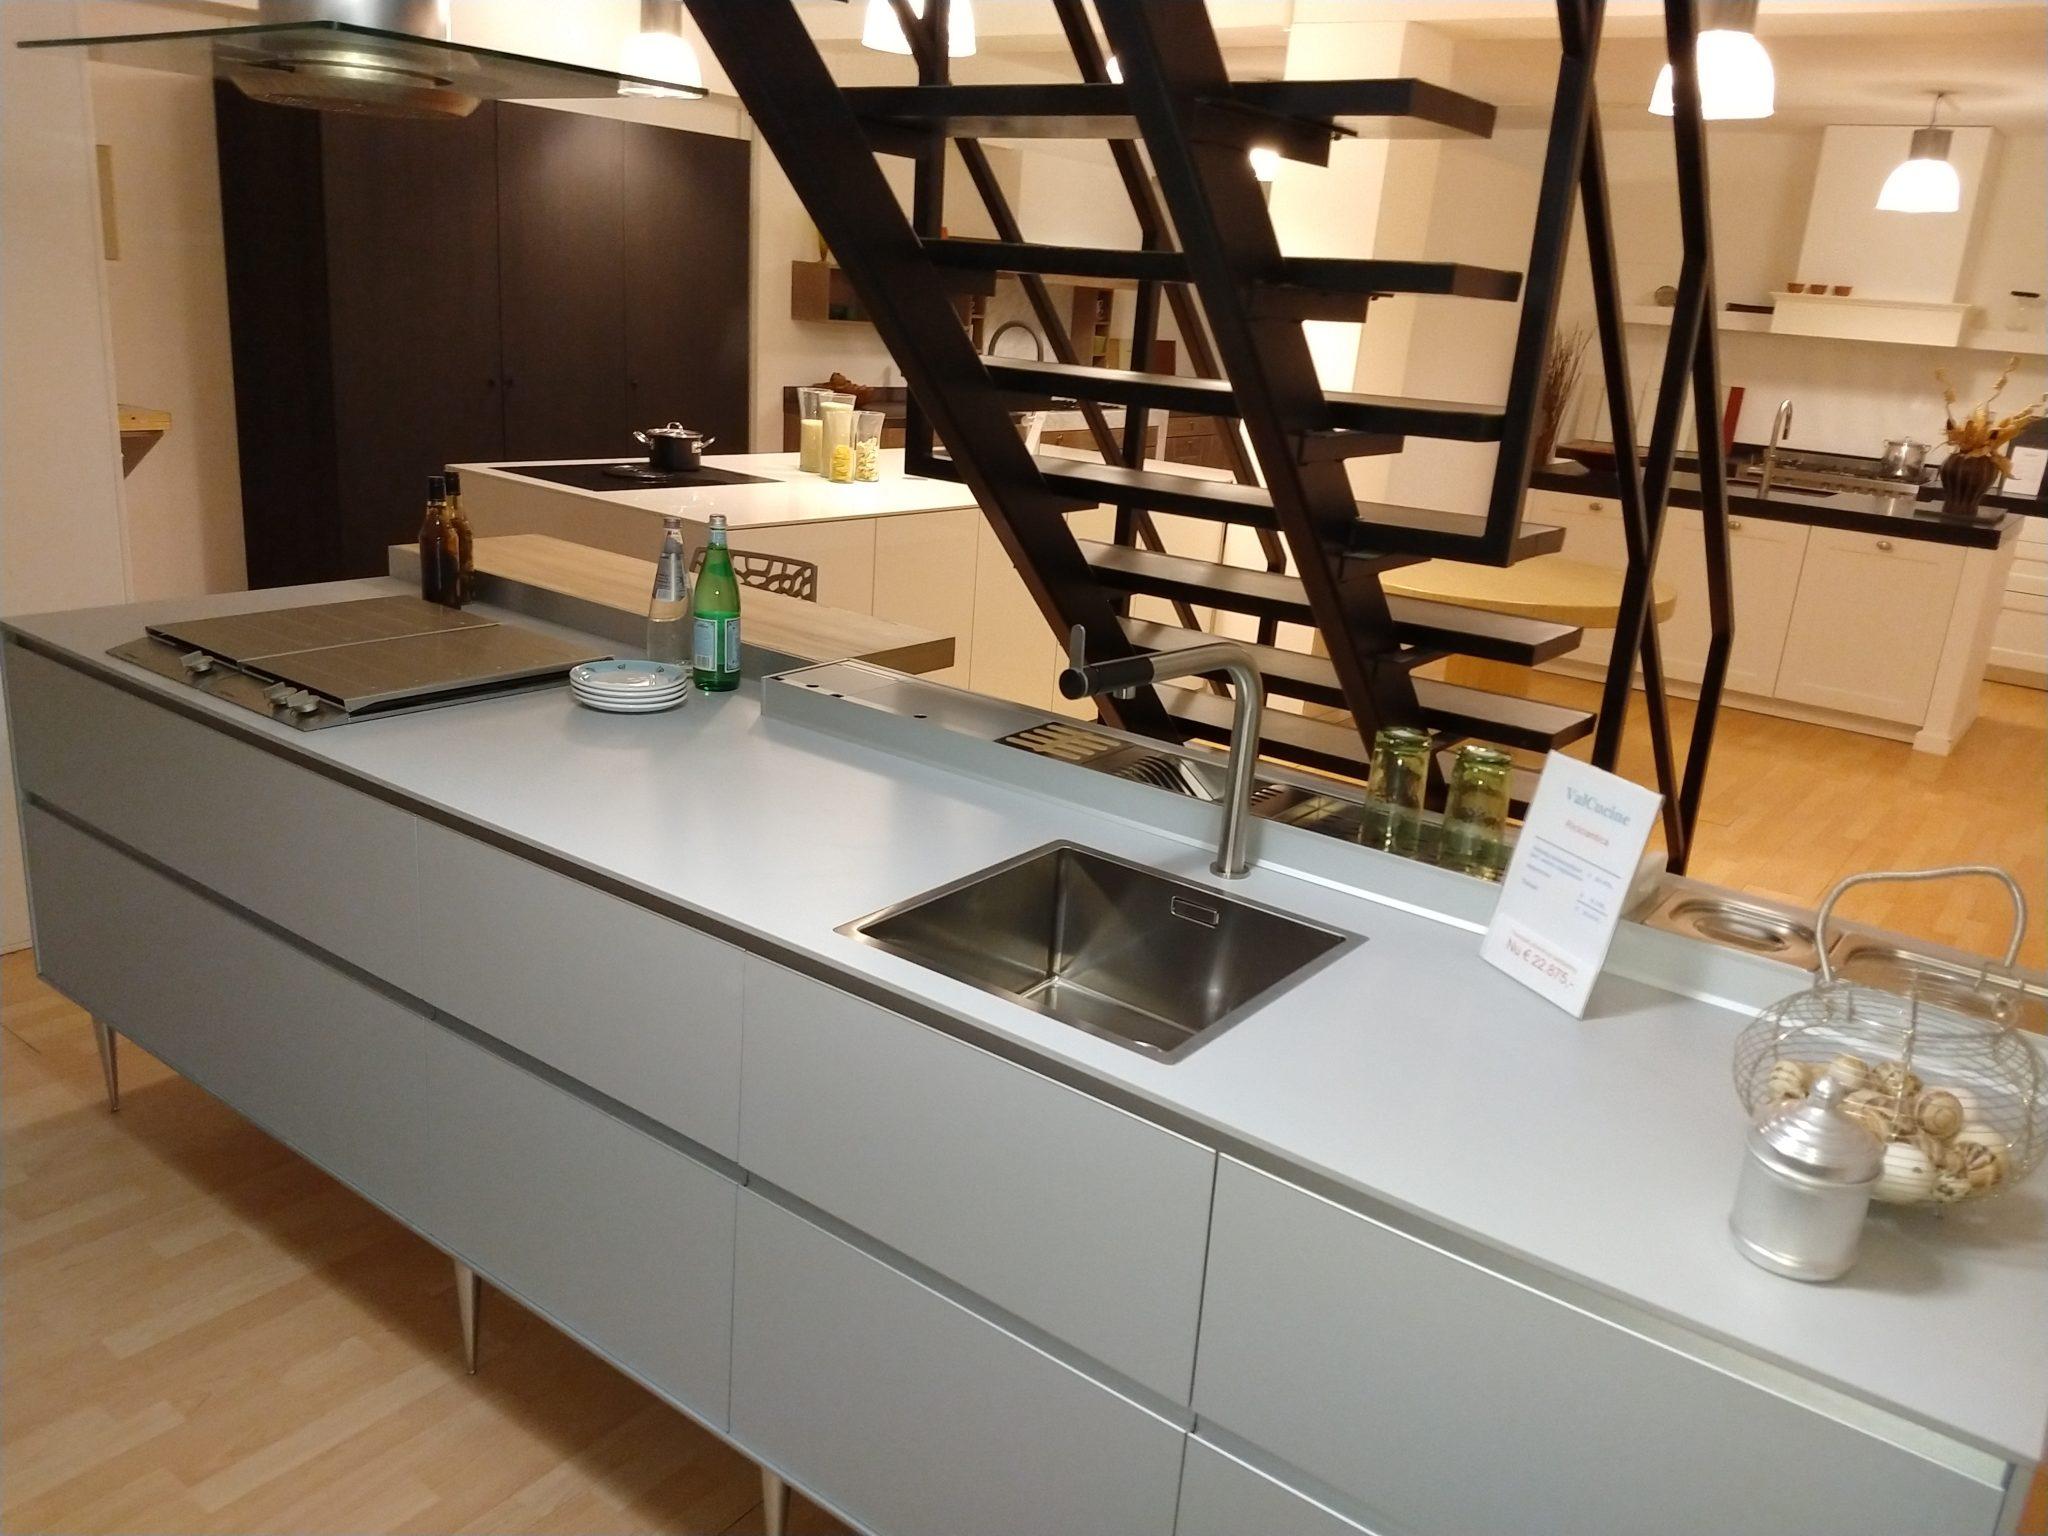 Eggersmann Keukens Prijzen : Showroom sale rikken keukens